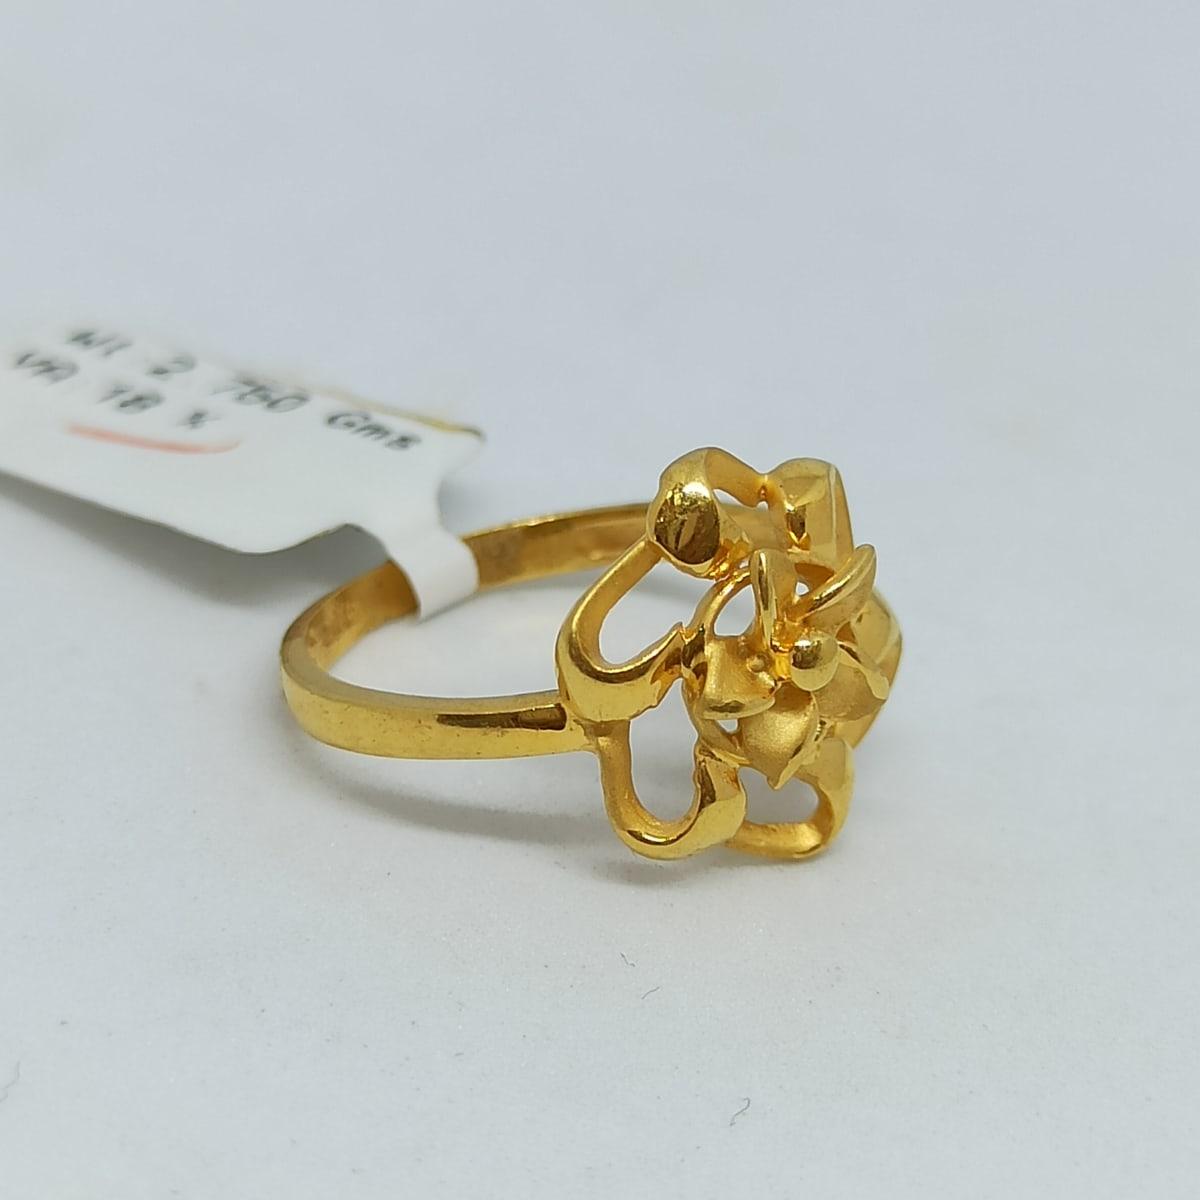 Floral Plain Gold Ring